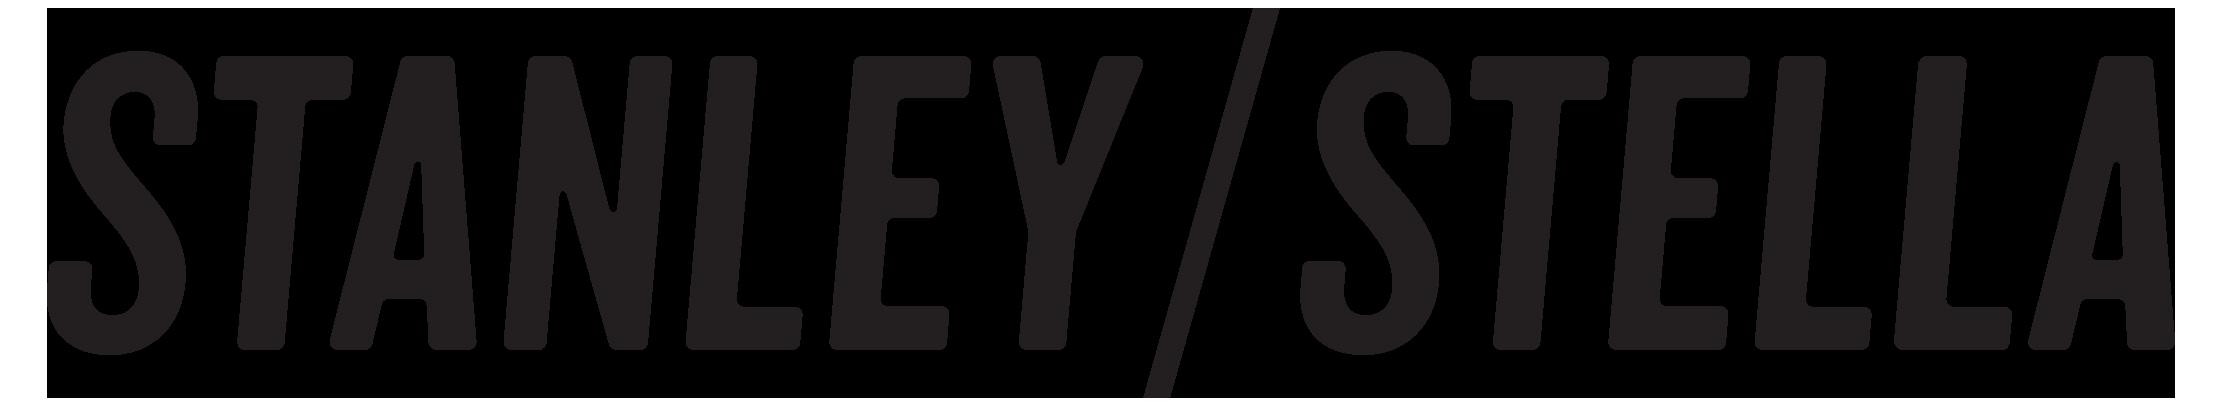 Logo Stanley Stella Adegme La fibre verte Dealer Officiel